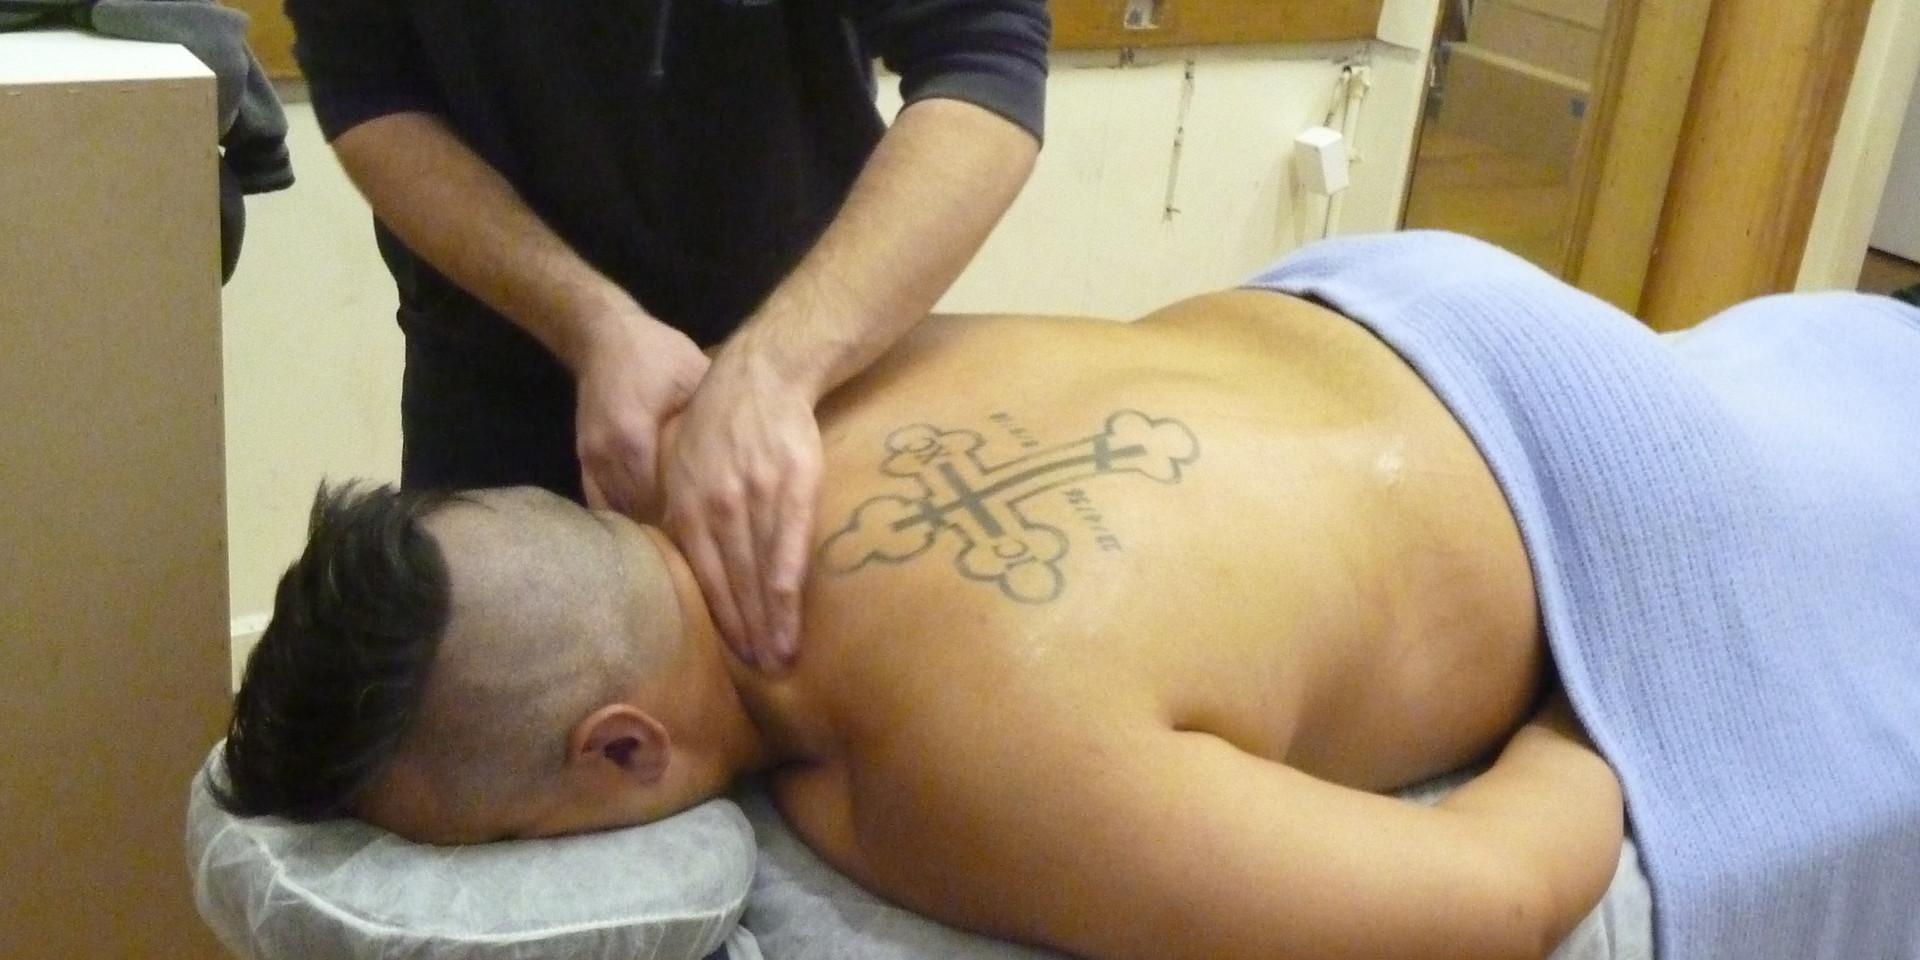 Massaging at Melbourne City Wrestling: Gino Gamino (Mr. Juicy)